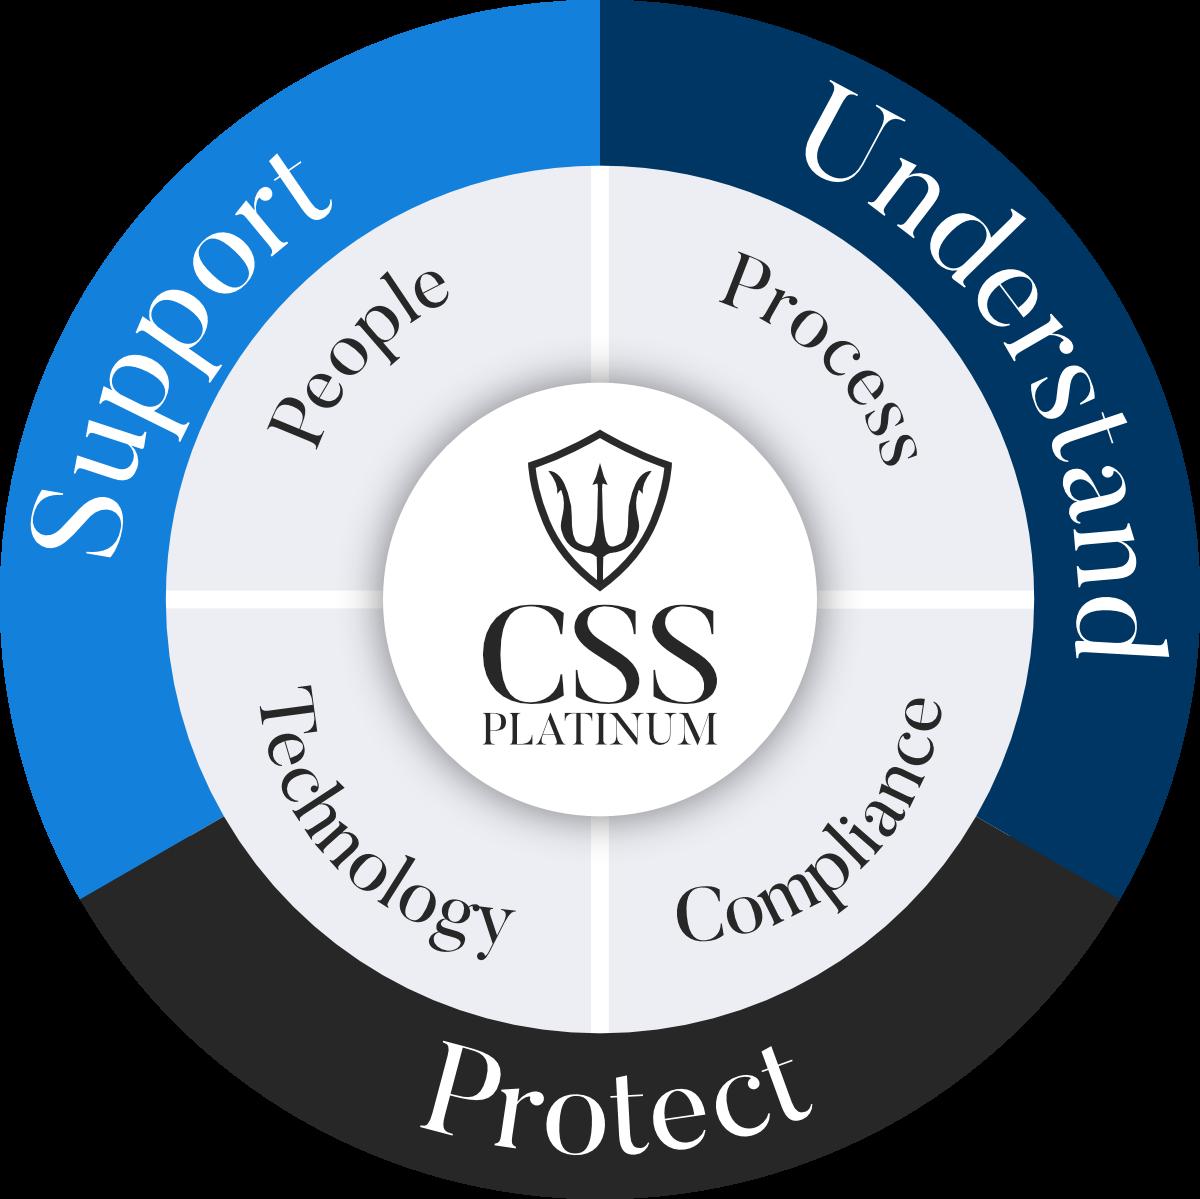 CSS Platinum methodology